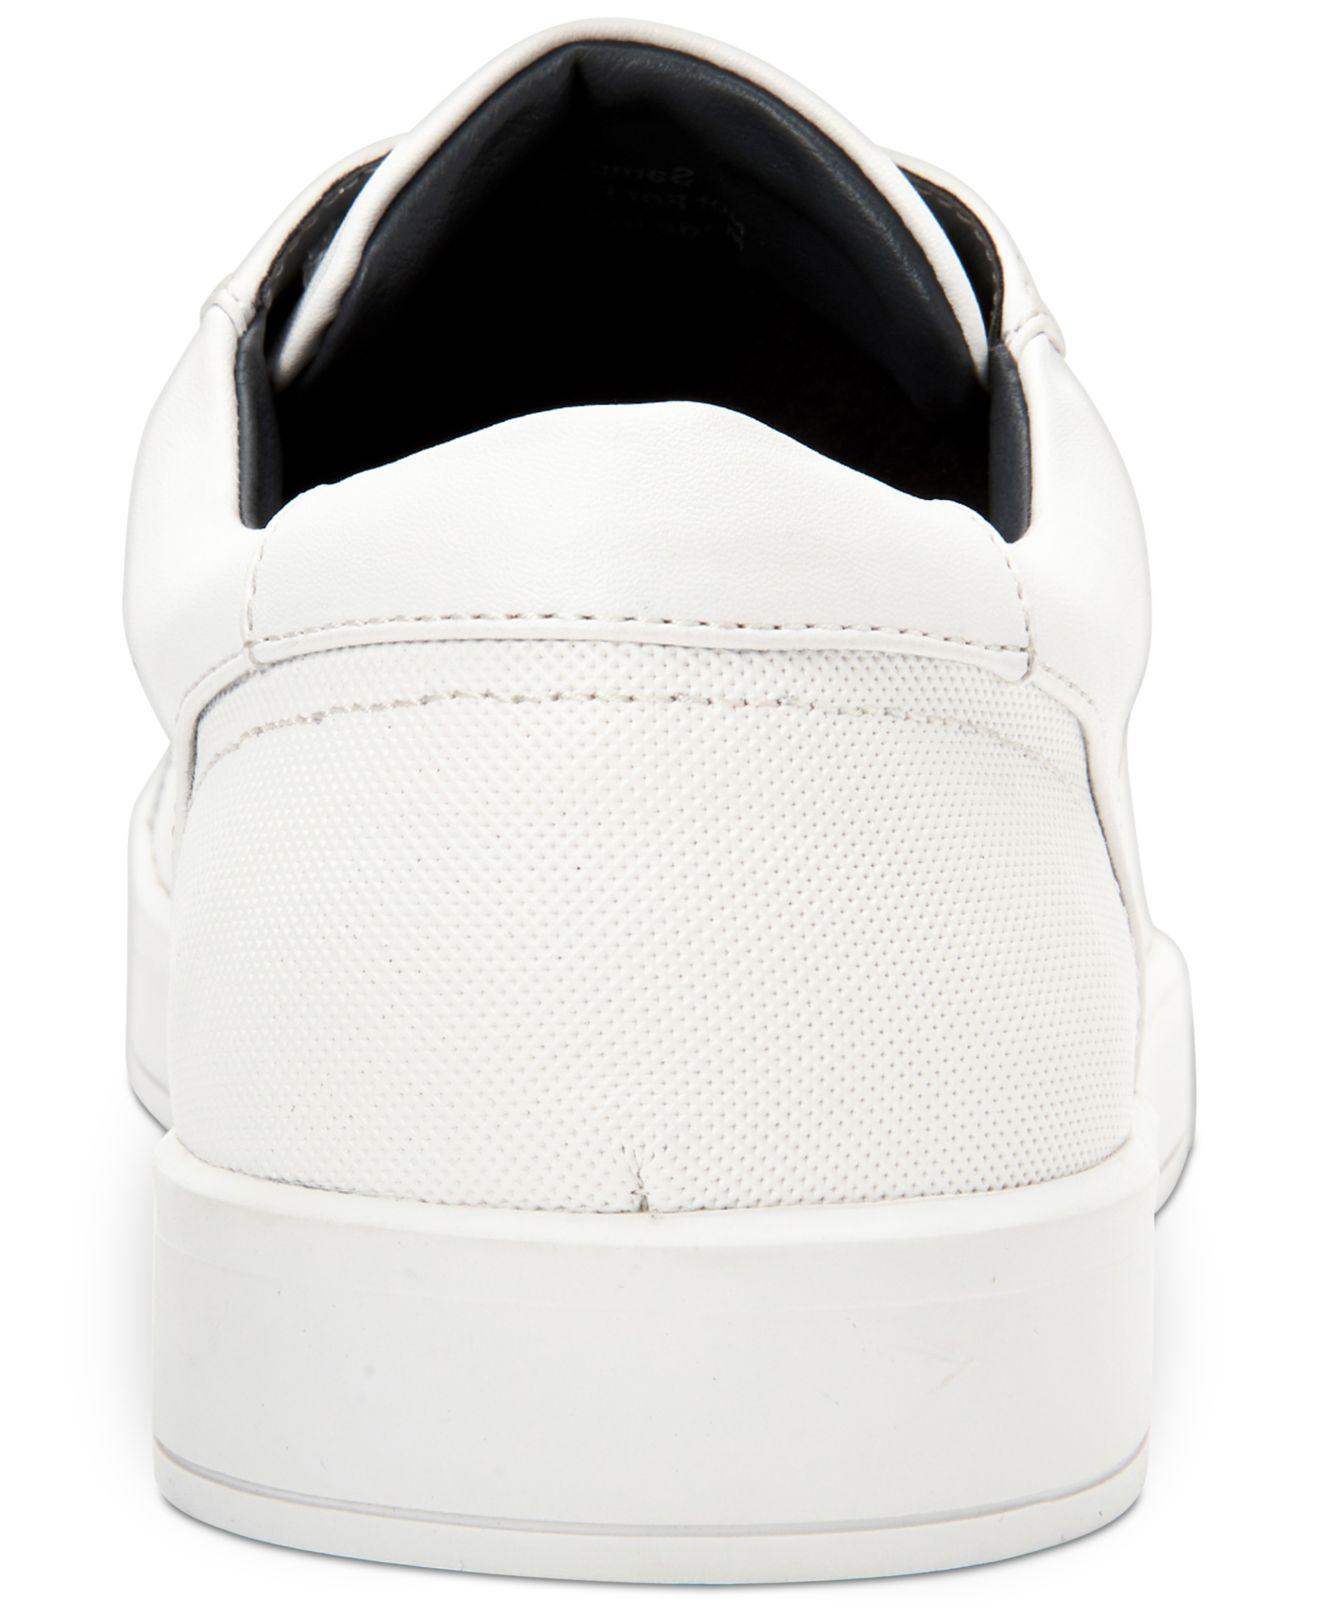 Calvin Klein Bowyer Diamond Sneakers in